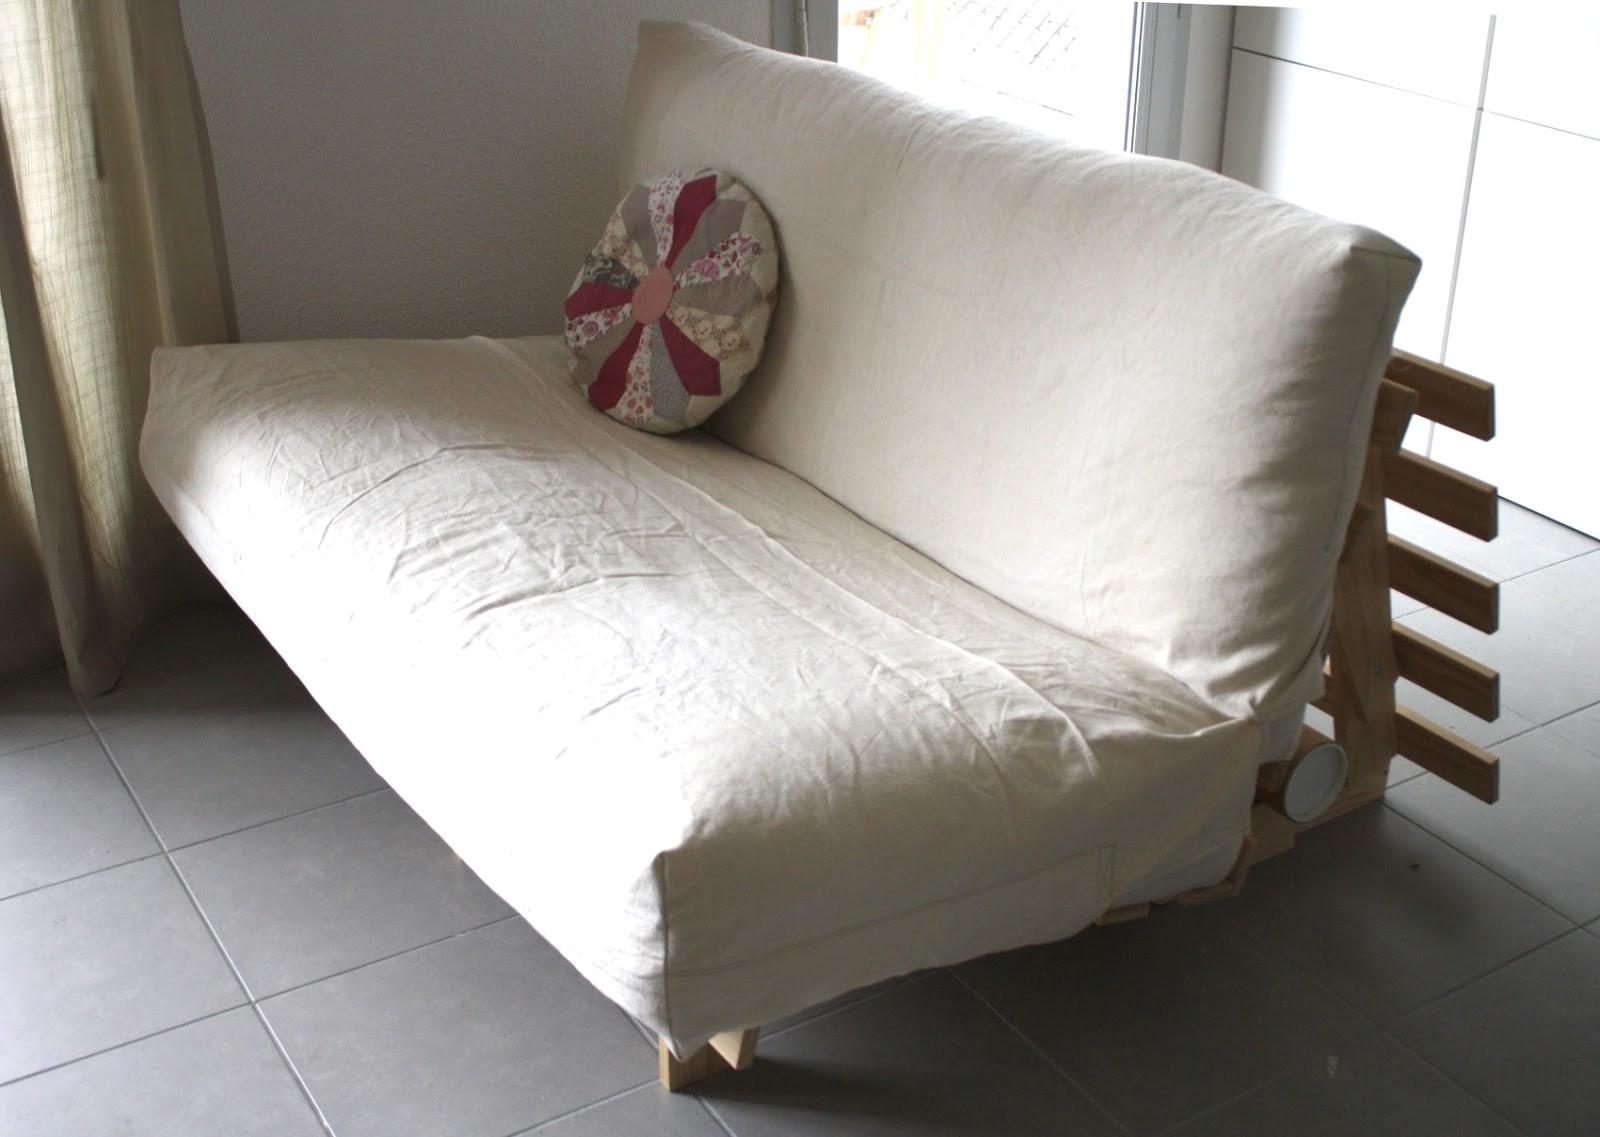 Canapé Style Anglais Fleuri Frais Photos Matelas Pour Canap Bz Canape Bz Ikea Housse Canapac Bz Ikea New